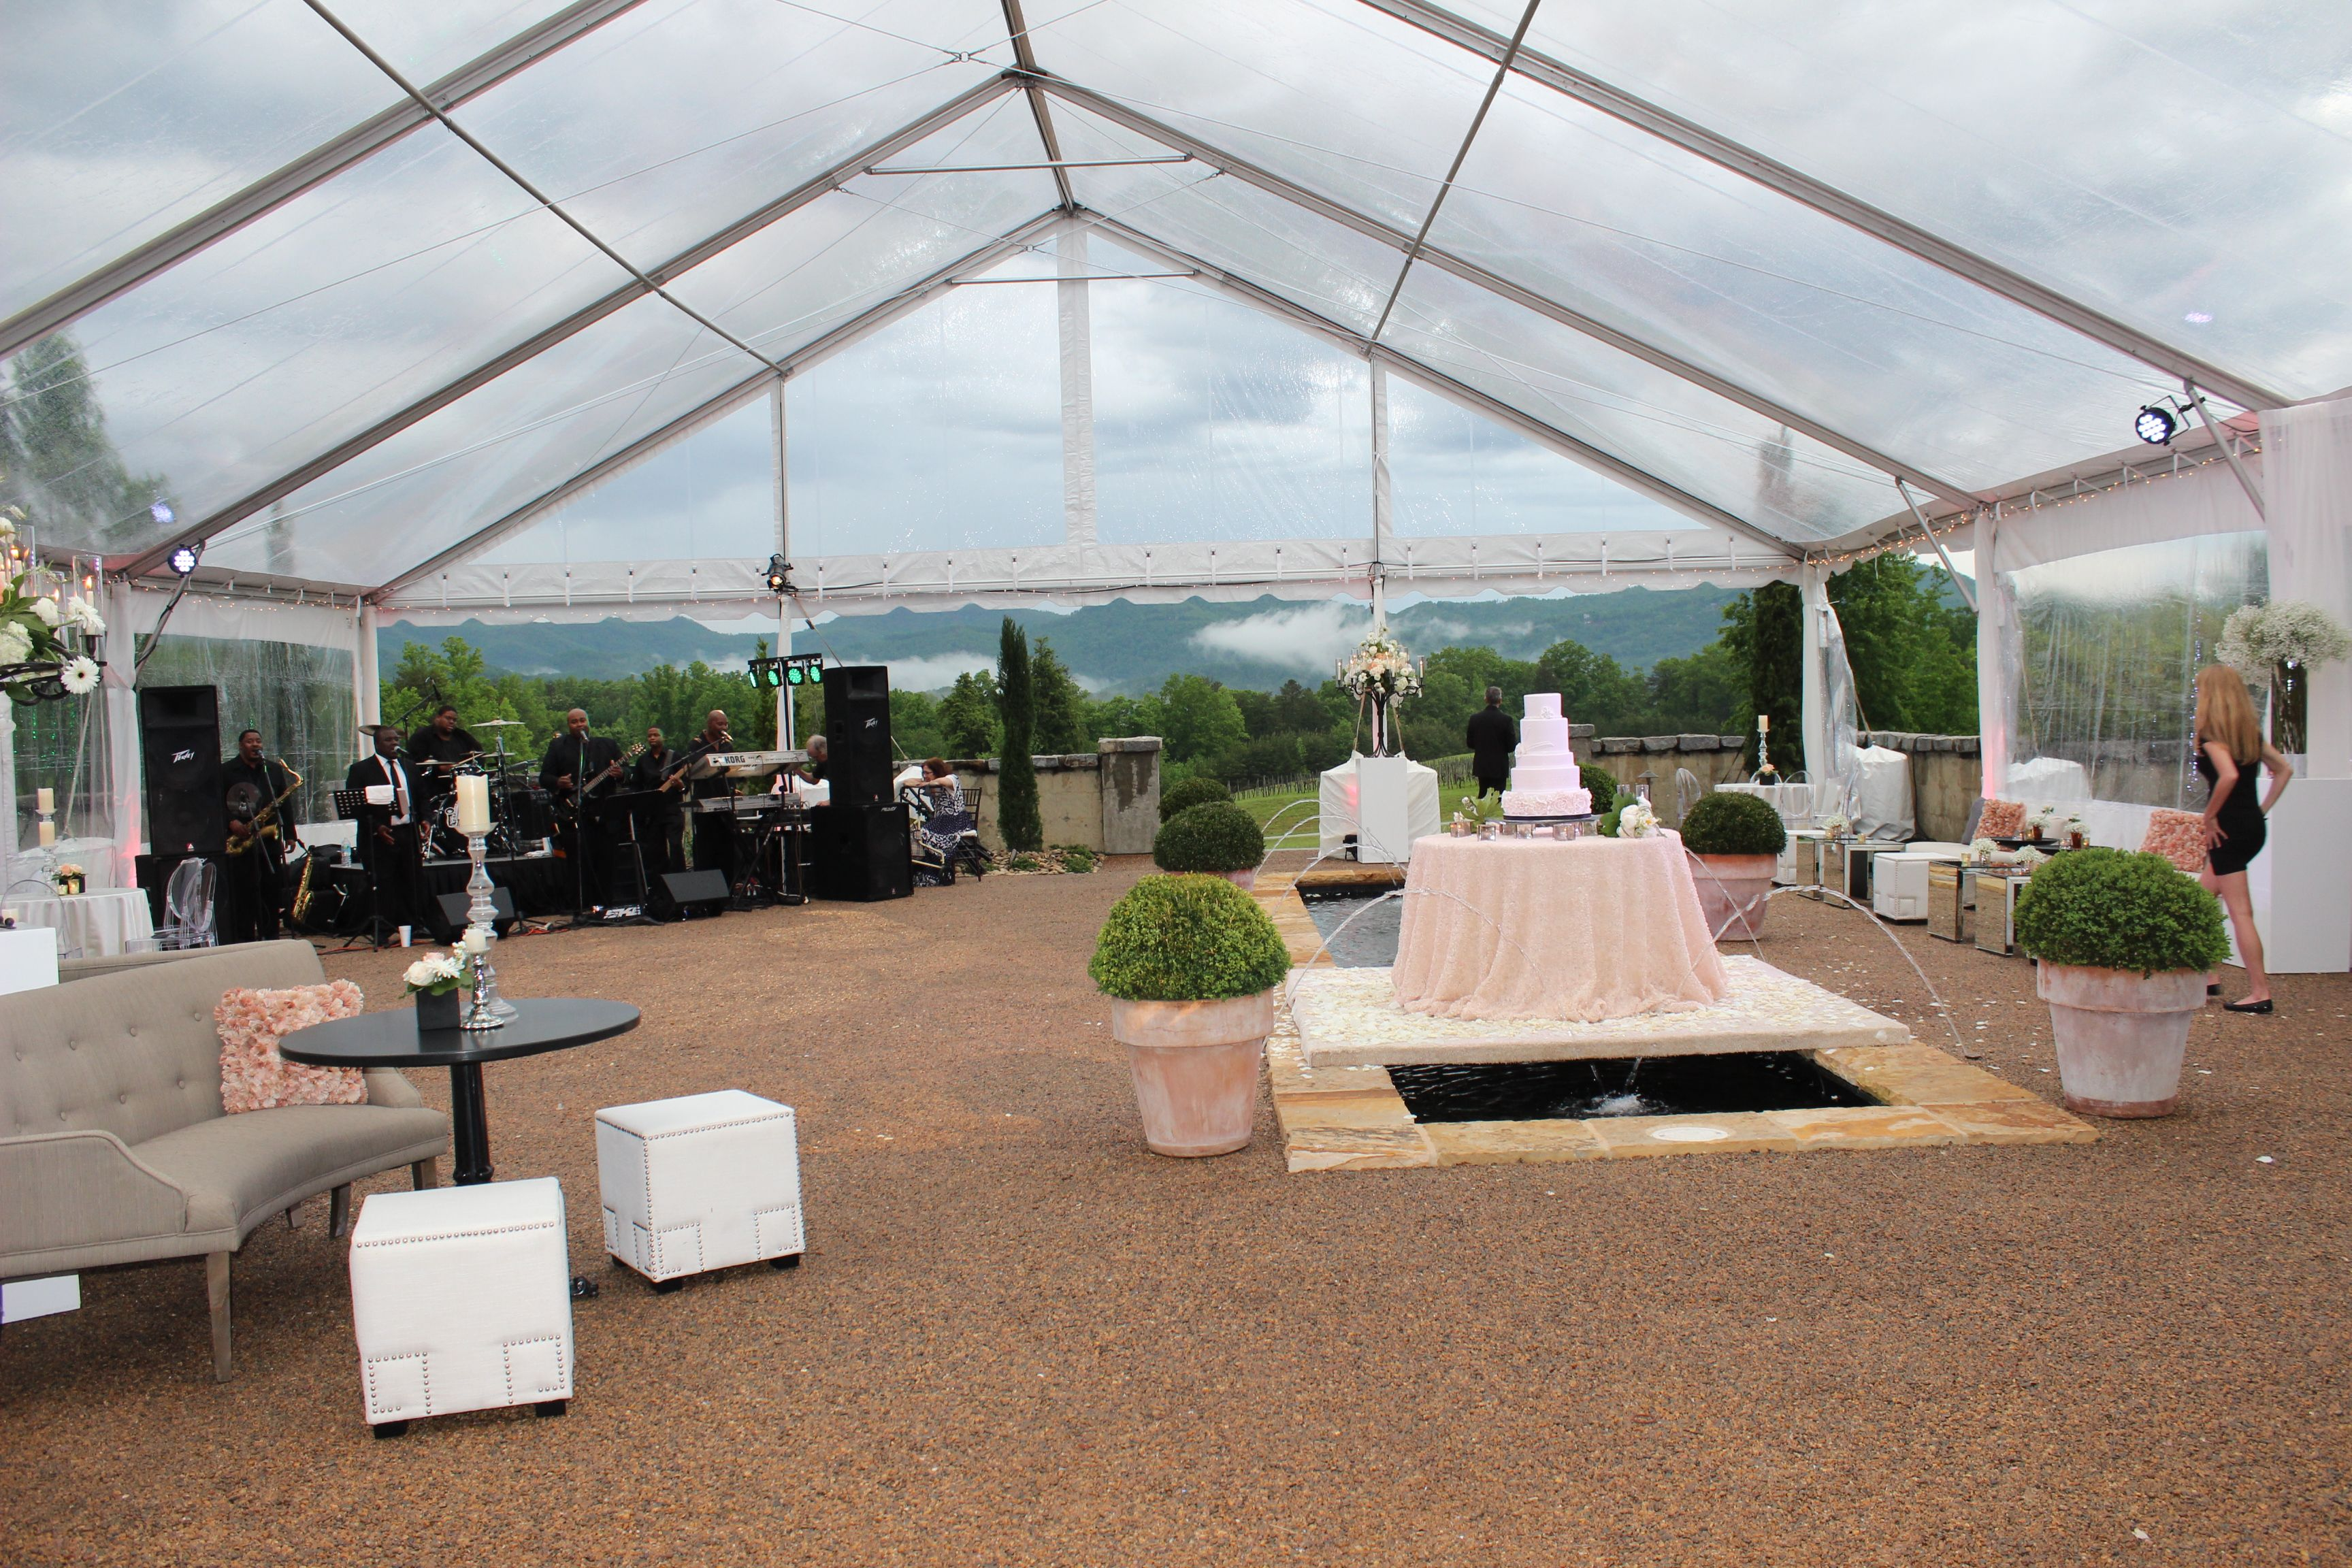 Hotel Domestique Travelers Rest Sc Brenda M Owen Wedding Officiant Minister